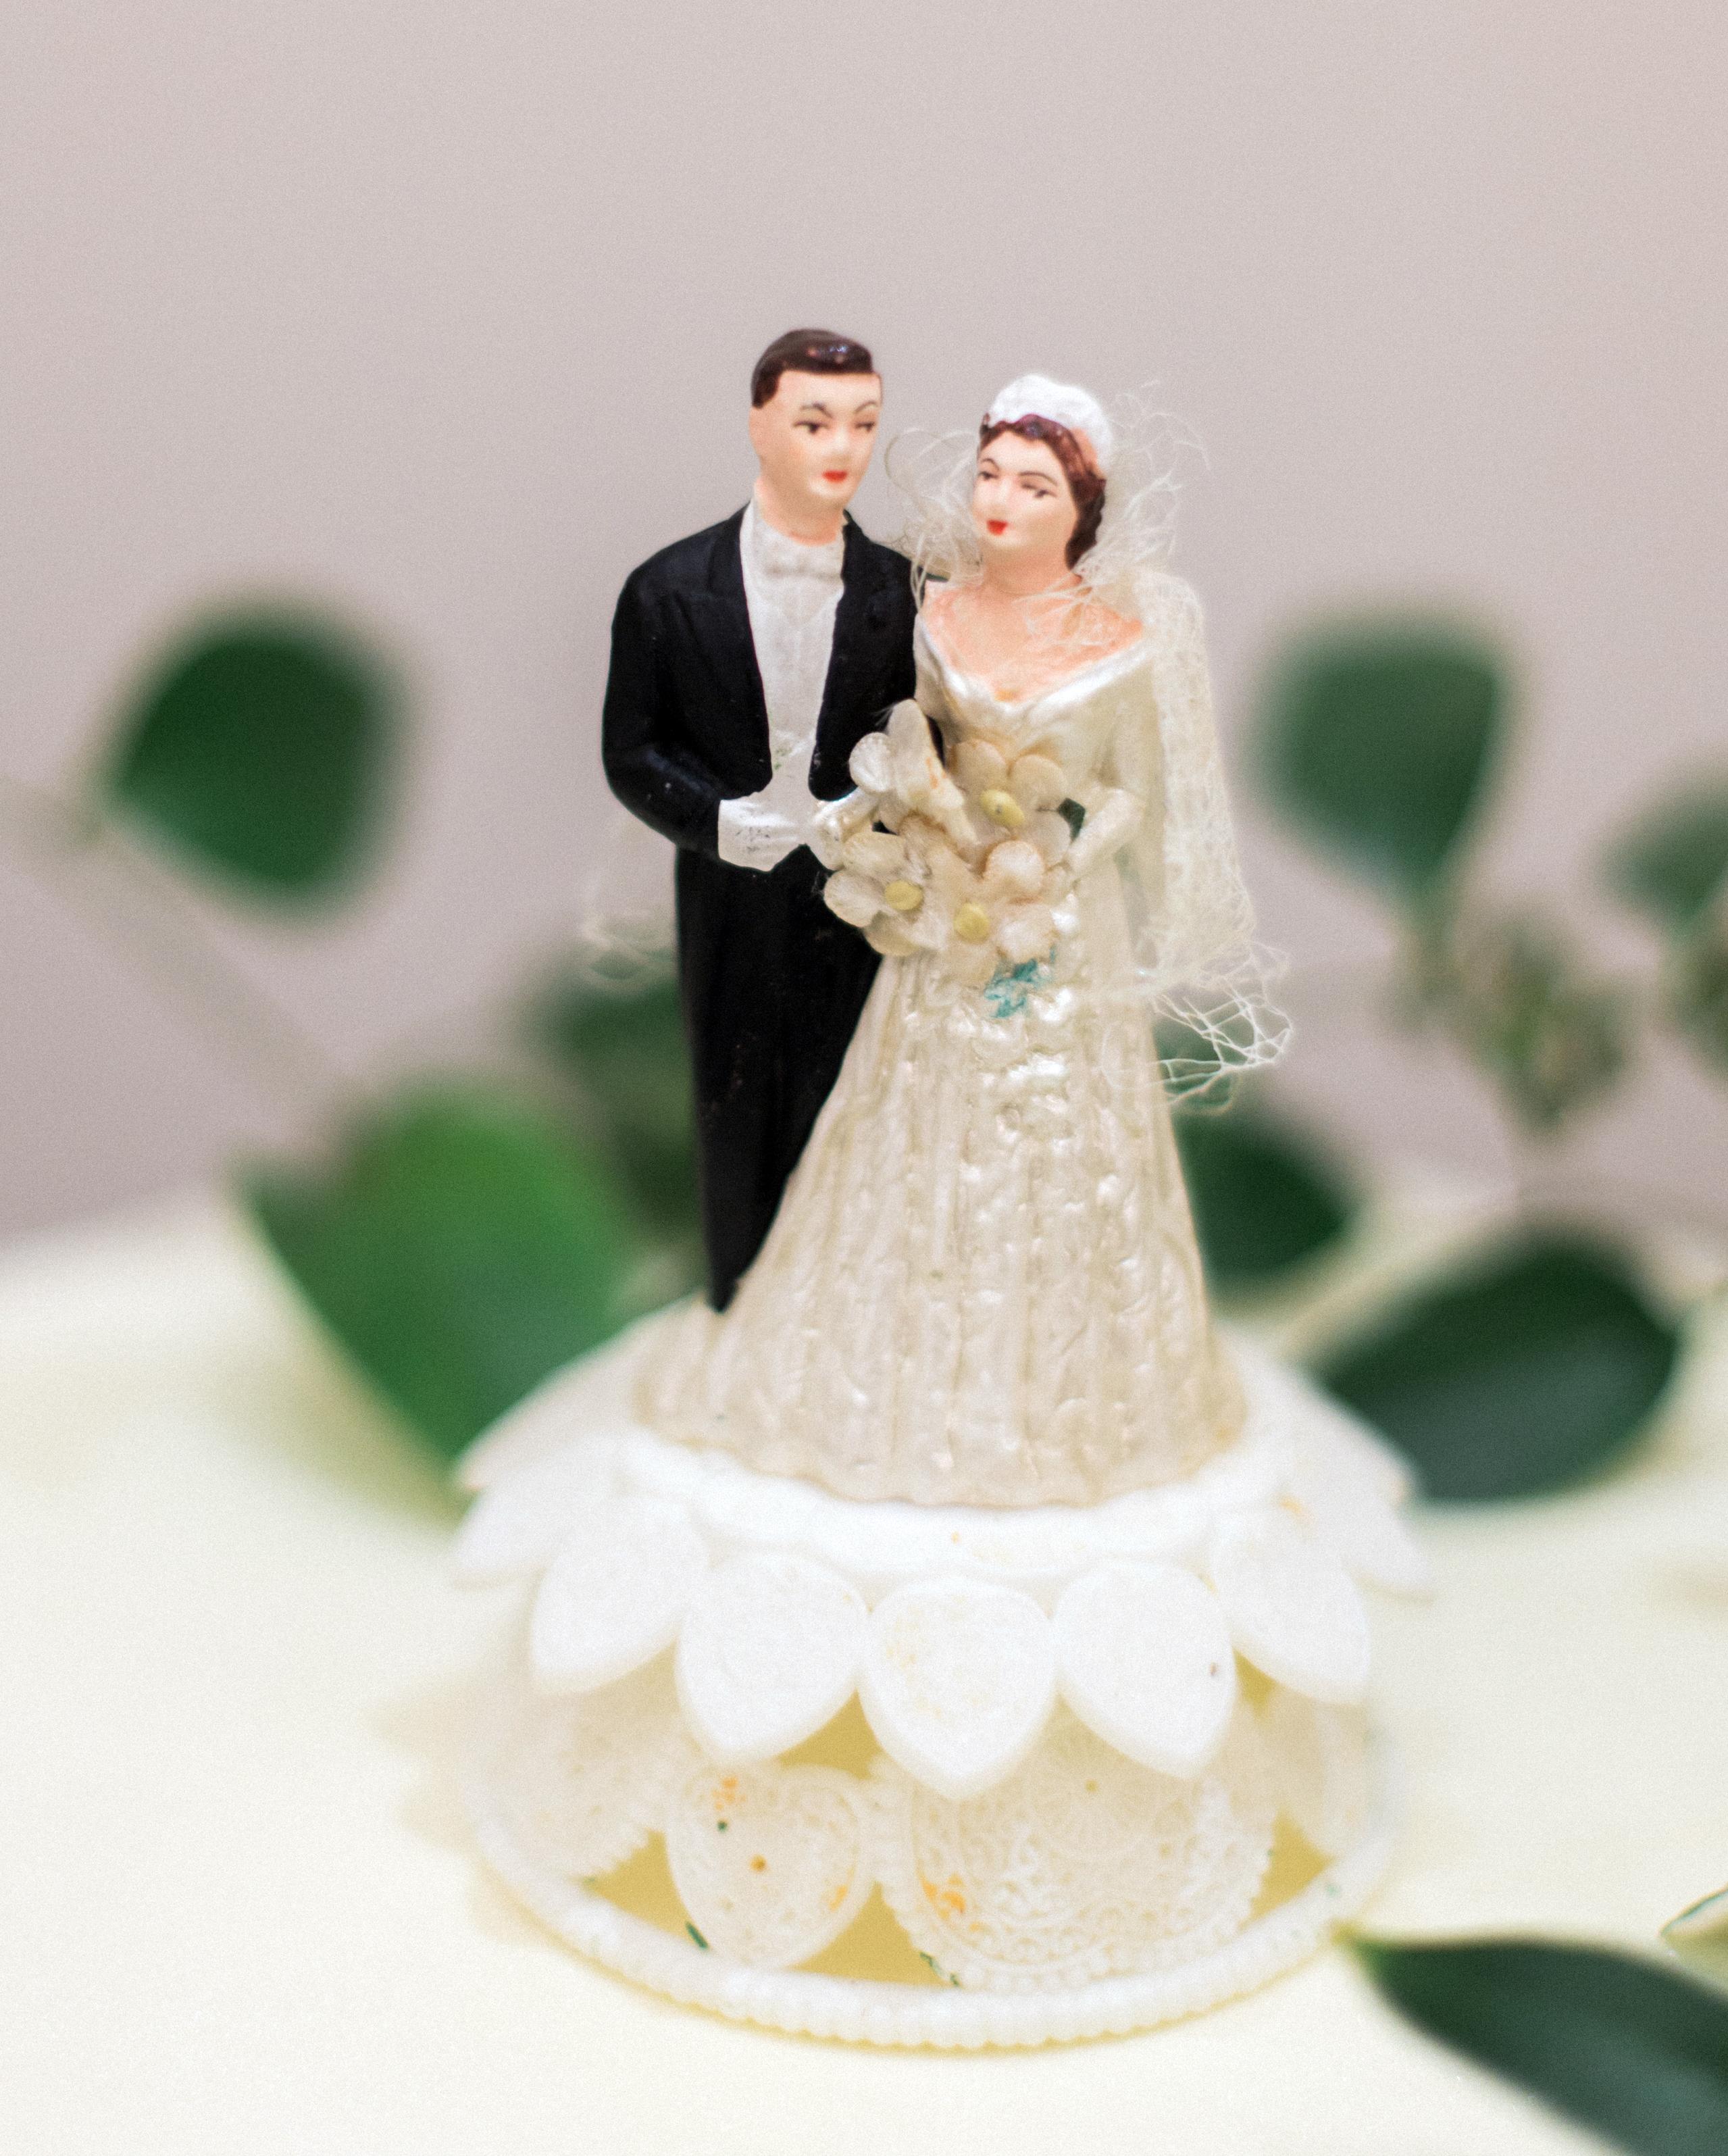 rachel-tyson-wedding-caketopper-365-s112158-0915.jpg